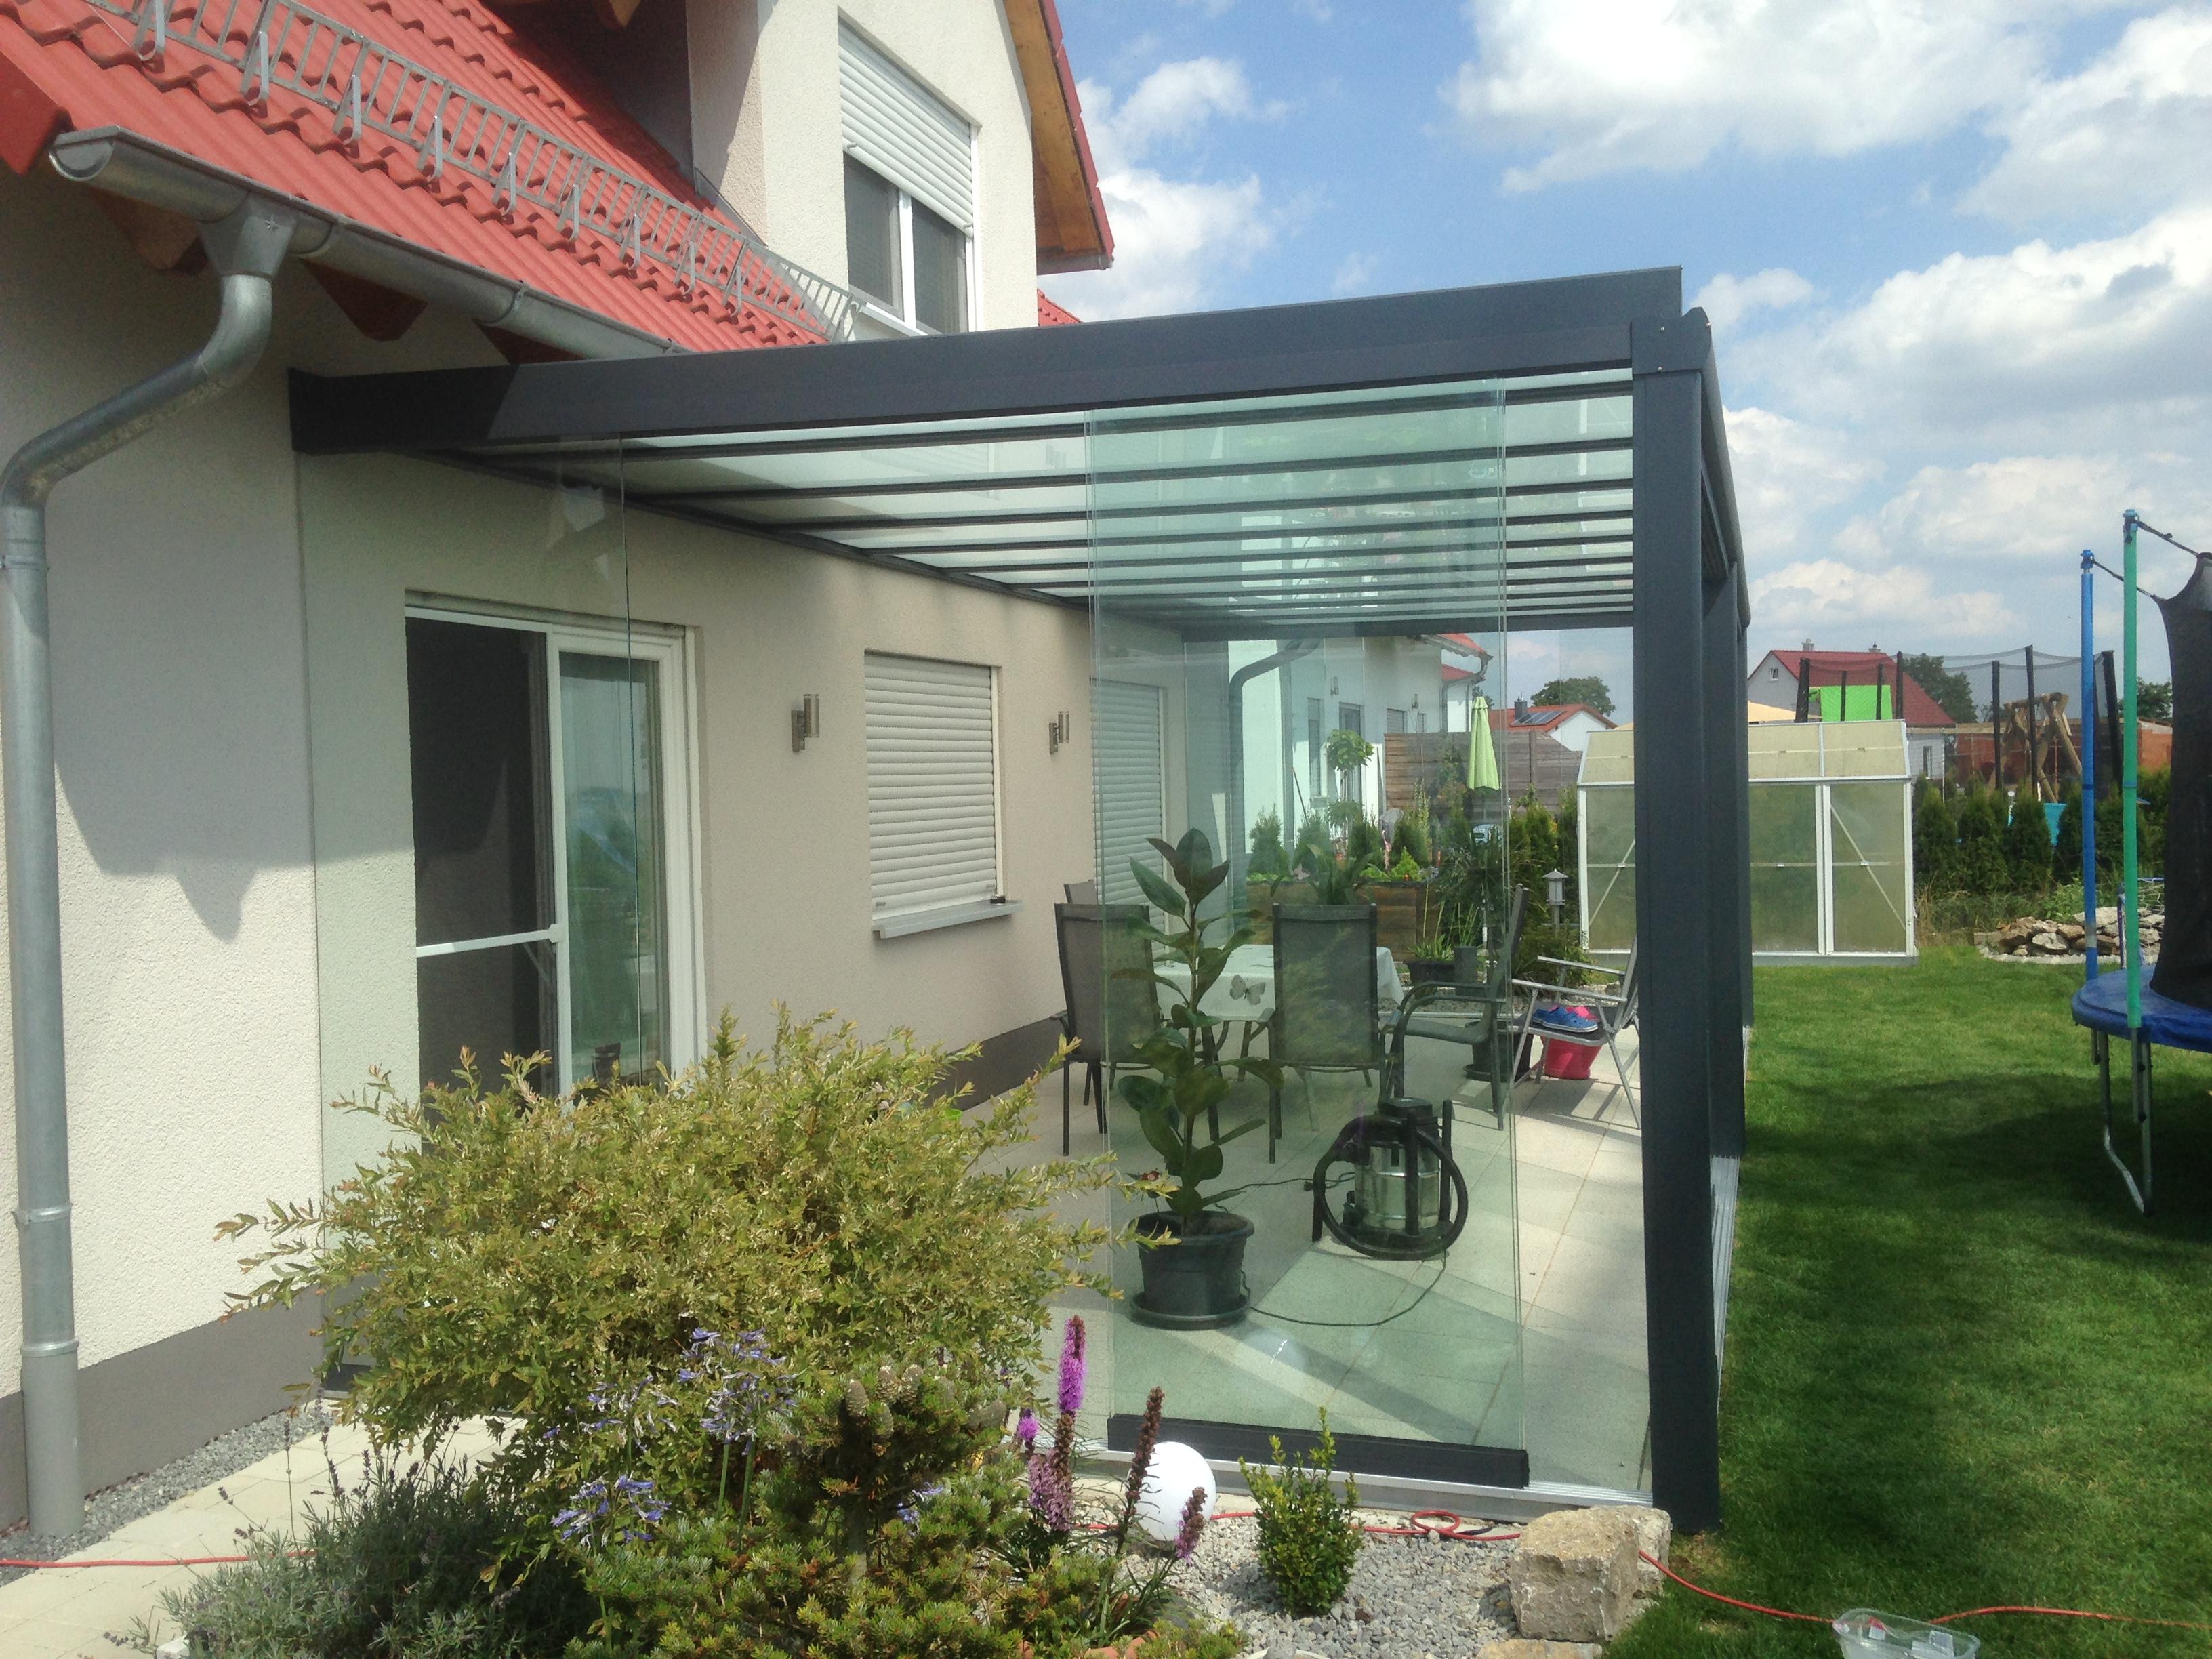 heroal terrassen berdachung aus aluminium wintergarten vsg ohne montage ebay. Black Bedroom Furniture Sets. Home Design Ideas